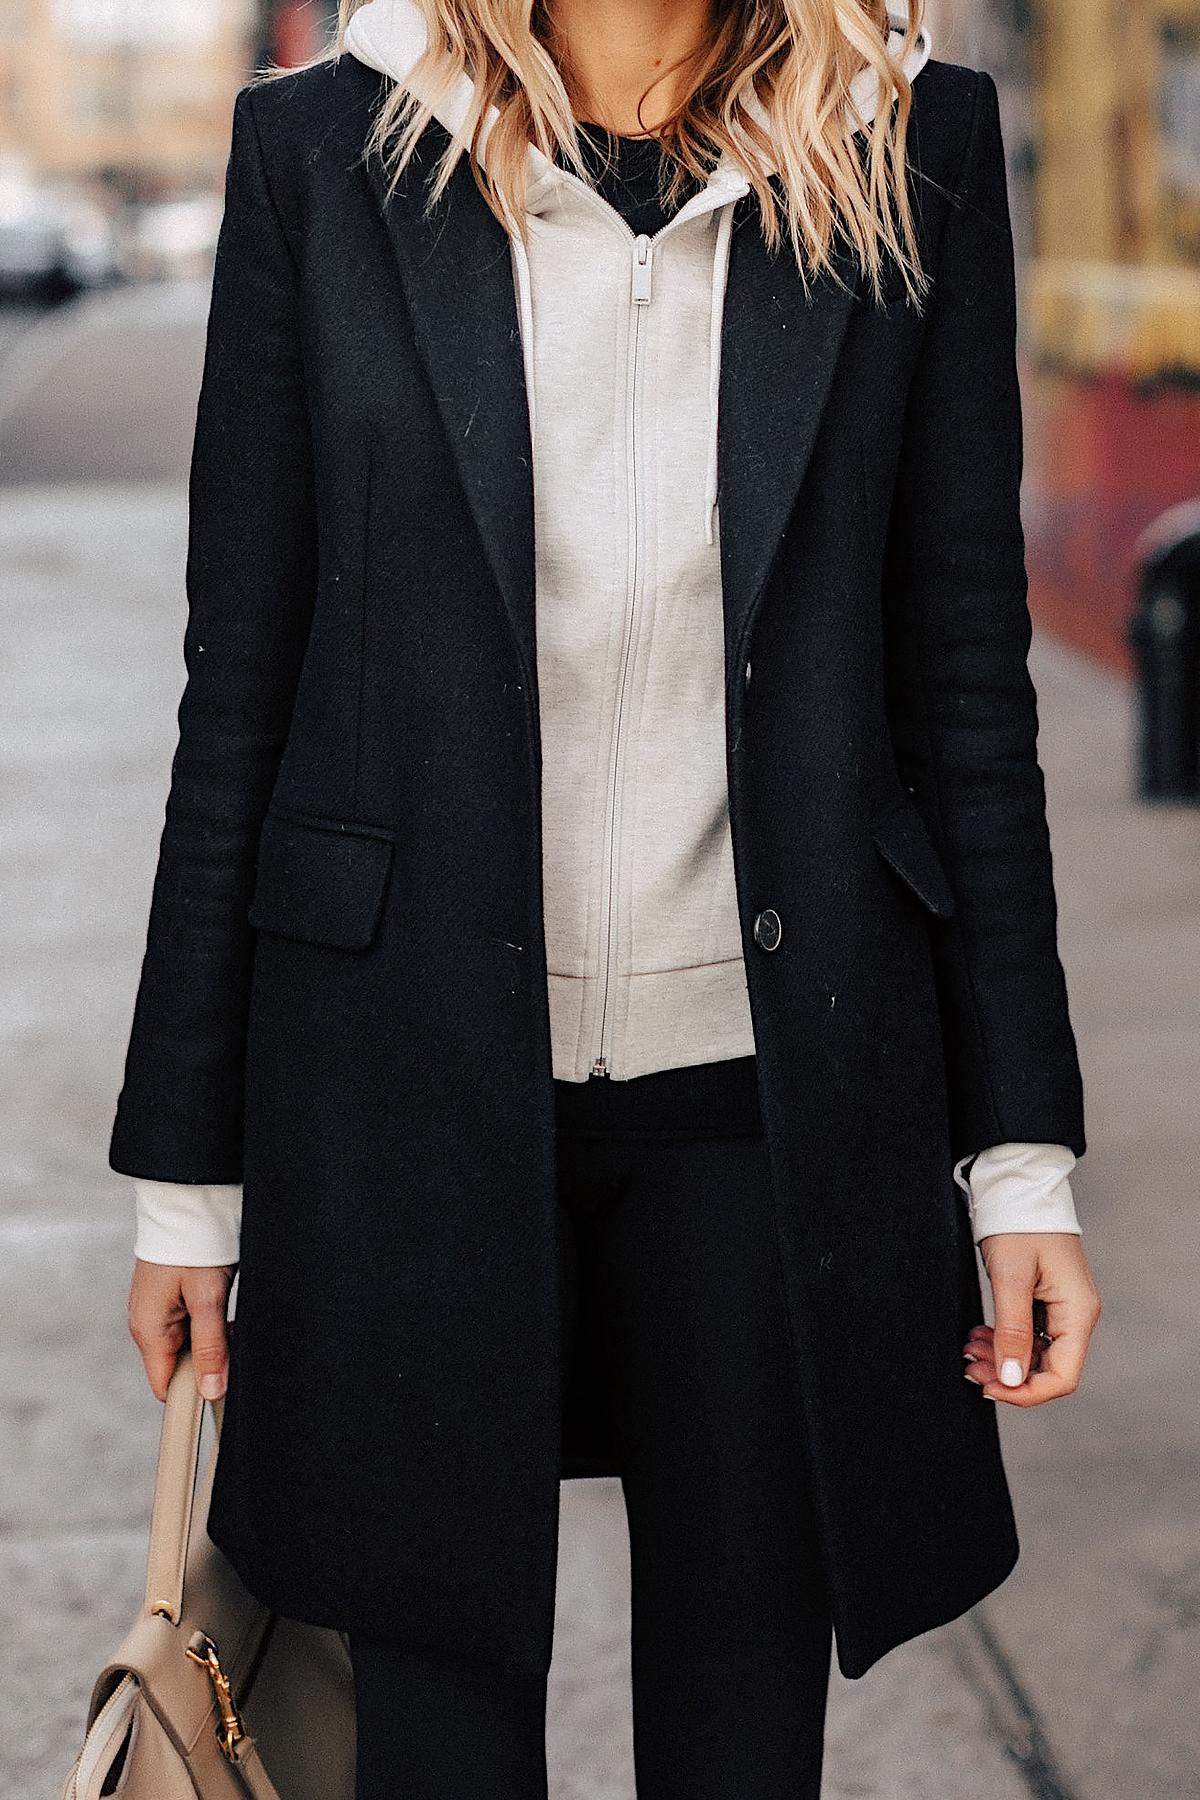 Fashion Jackson Wearing Black Wool Coat Grey Hoodie